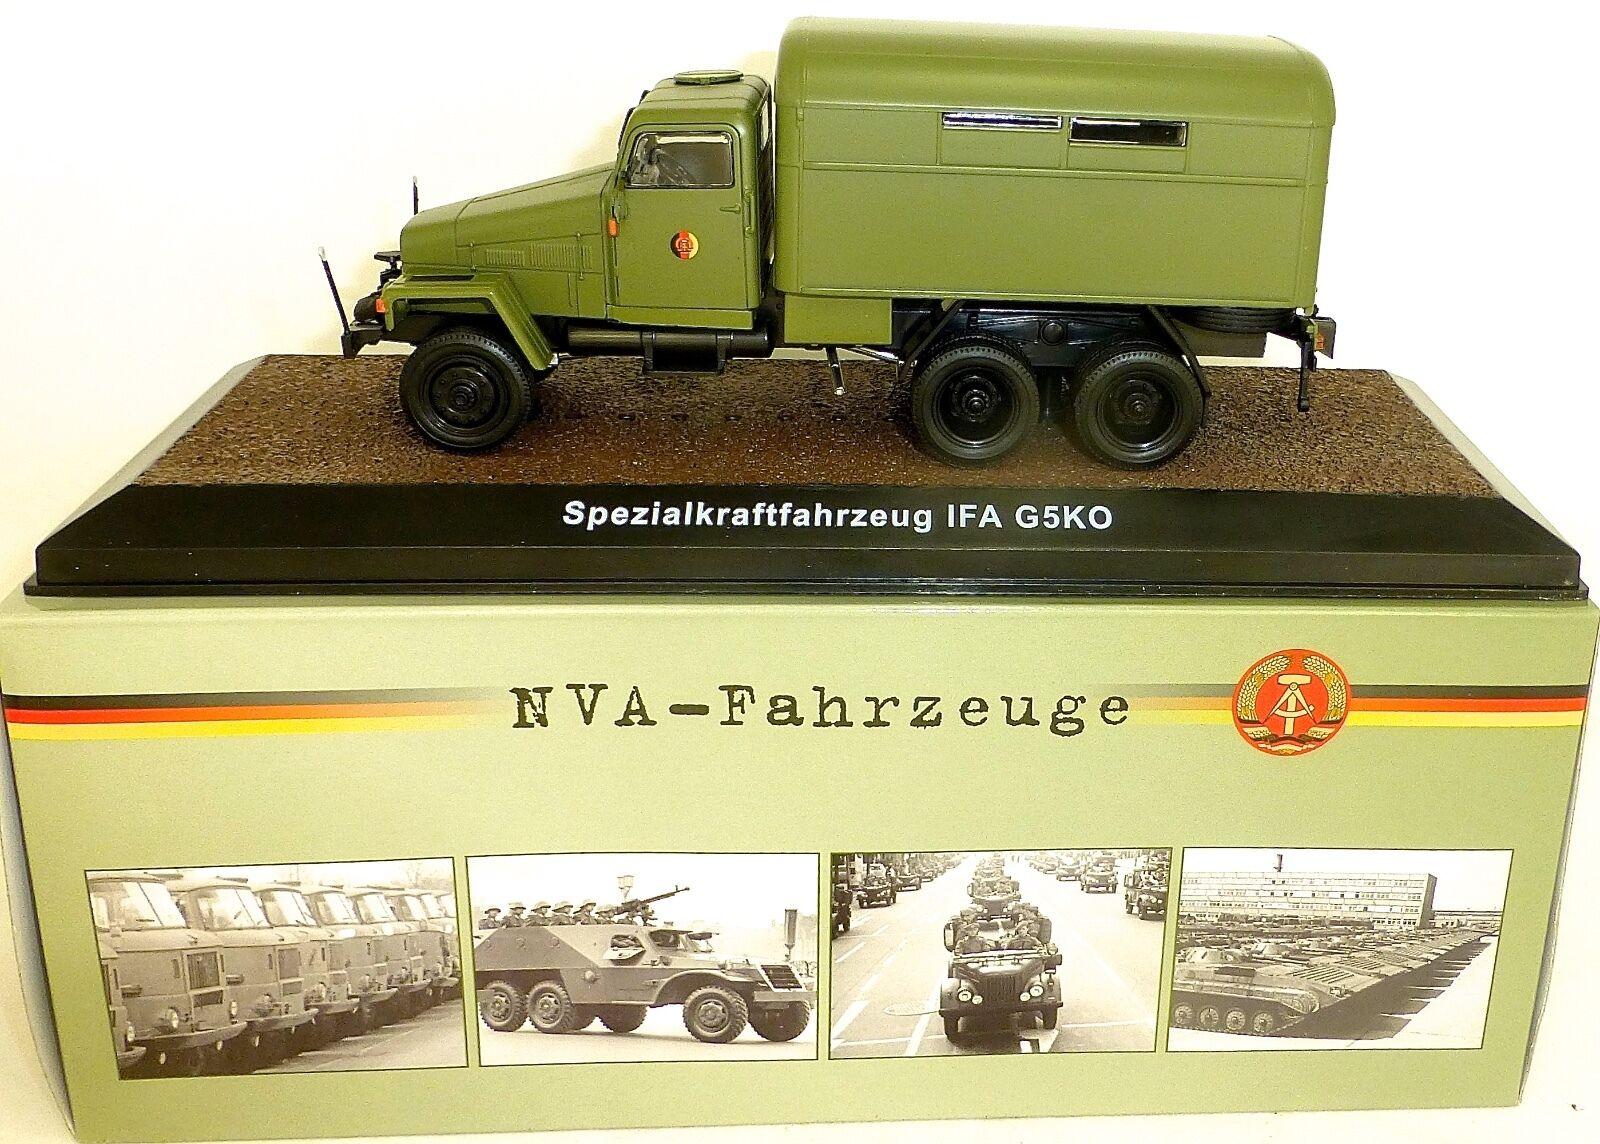 Spécial Automobile IFA g5ko RDA NVA véhicule ATLAS 1 43 neuf dans sa boîte Nouveau μ li1